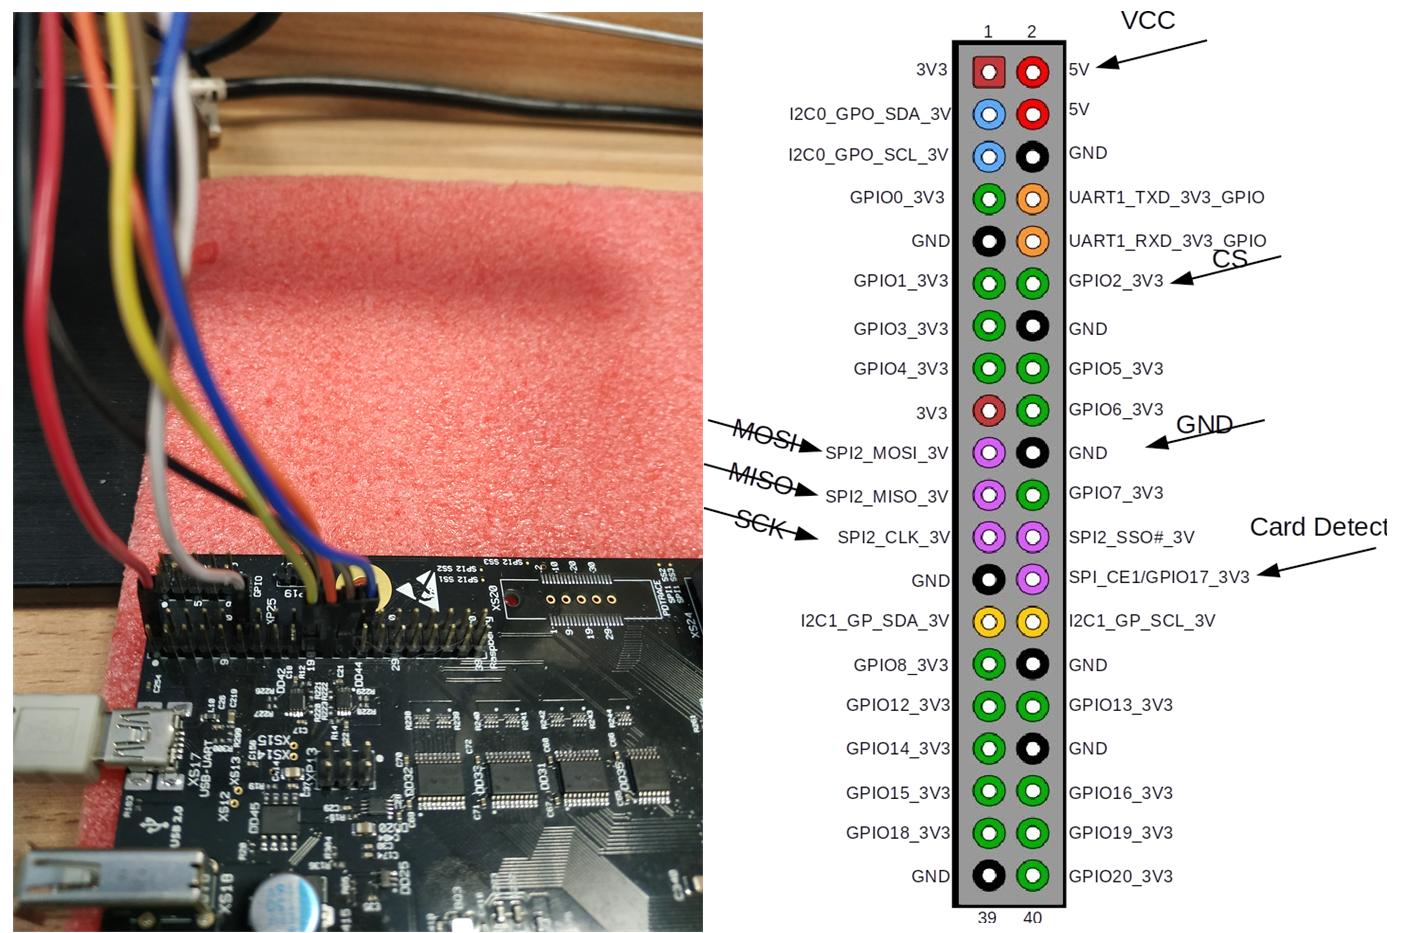 Апгрейд отладочной платы с процессором Baikal-T1: добавляем SD-карту - 3